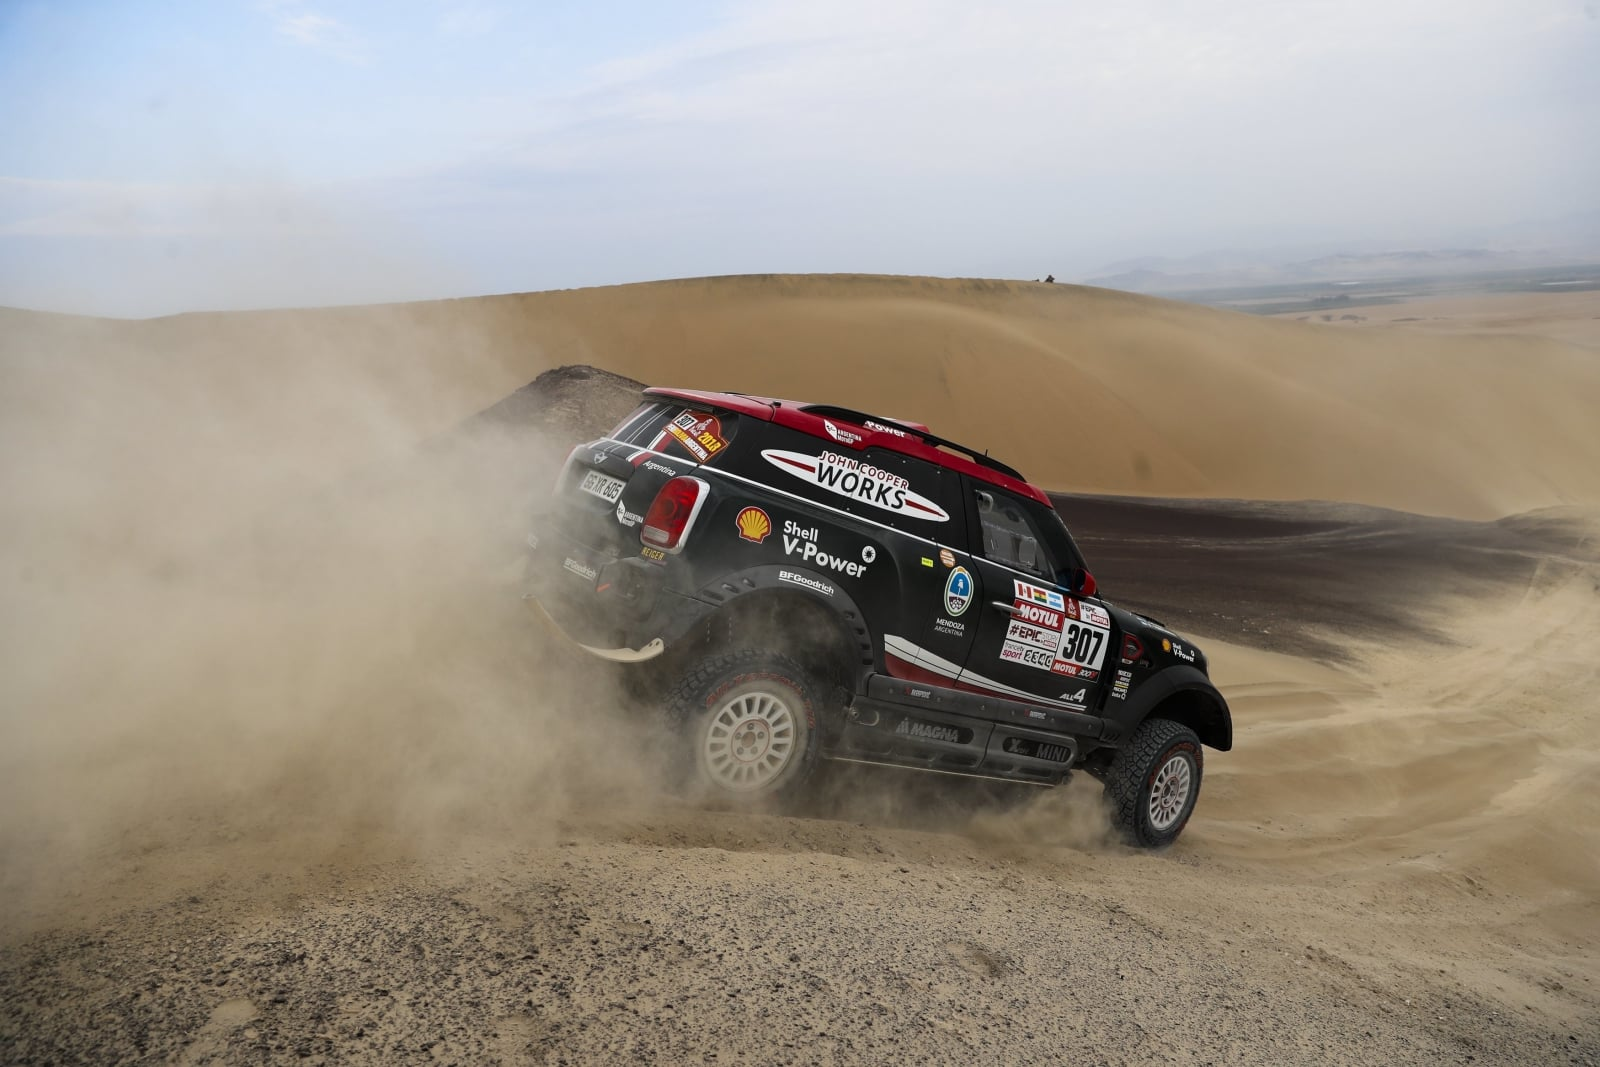 Peru, odcinek Wyścigu Dakar EPA/DAVID FERNANDEZ